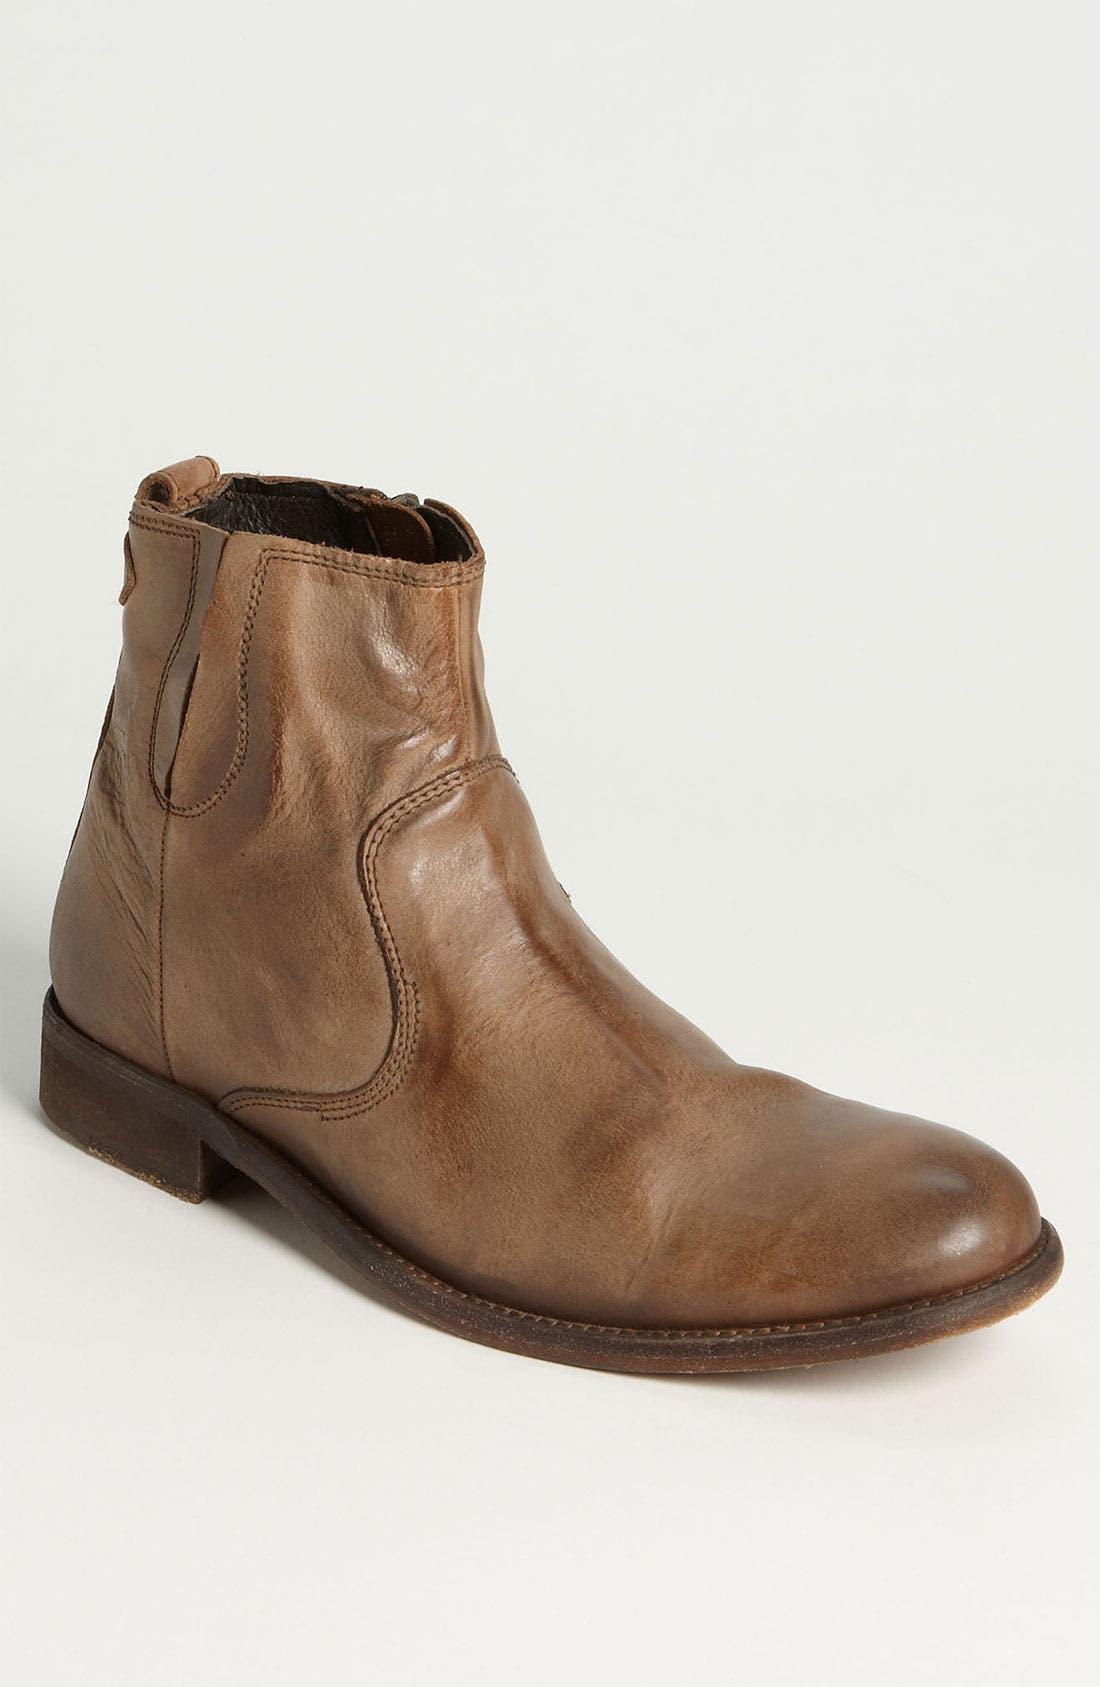 Main Image - Bacco Bucci 'Cotton' Boot (Men)